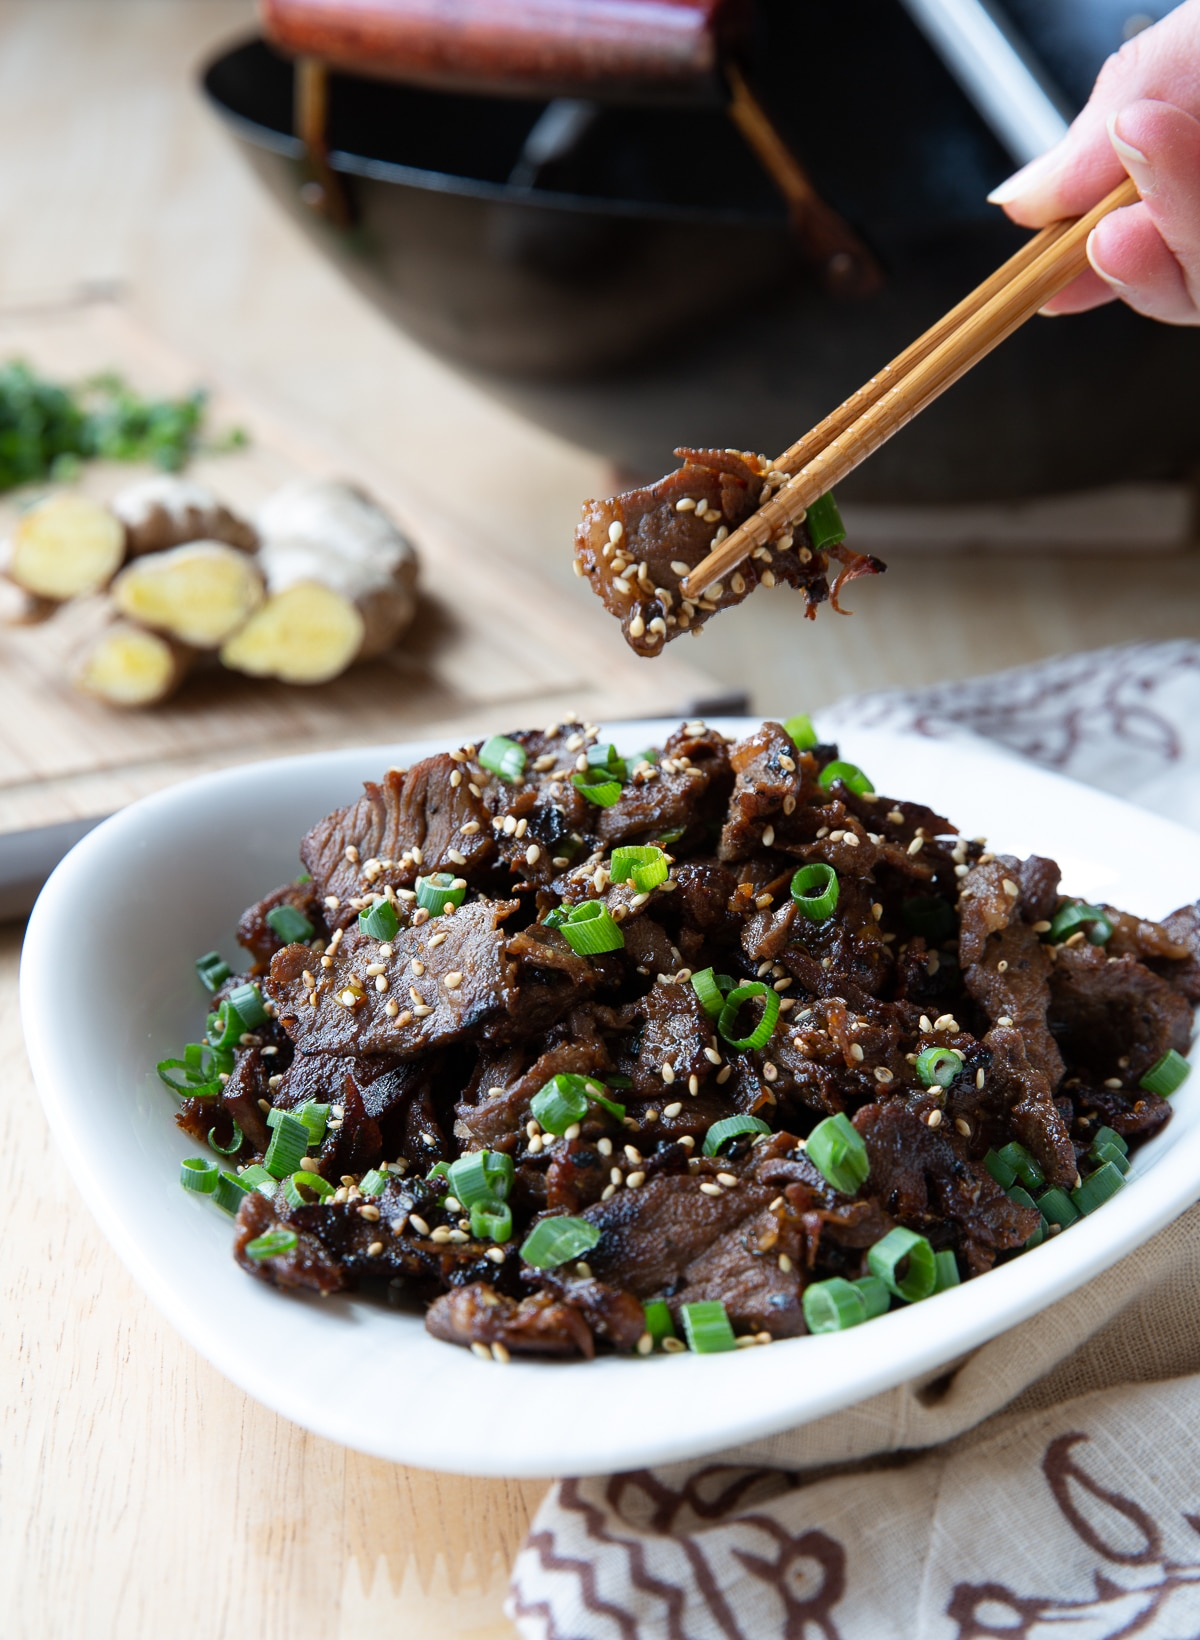 Best Bulgogi Recipe #ASpicyPerspective #KoreanBBQ #KoreanBBQRecipe #KoreanBeef #Bulgogi #BulgogiRecipe #Beef #BeefBulgogi #Dinner #Asian